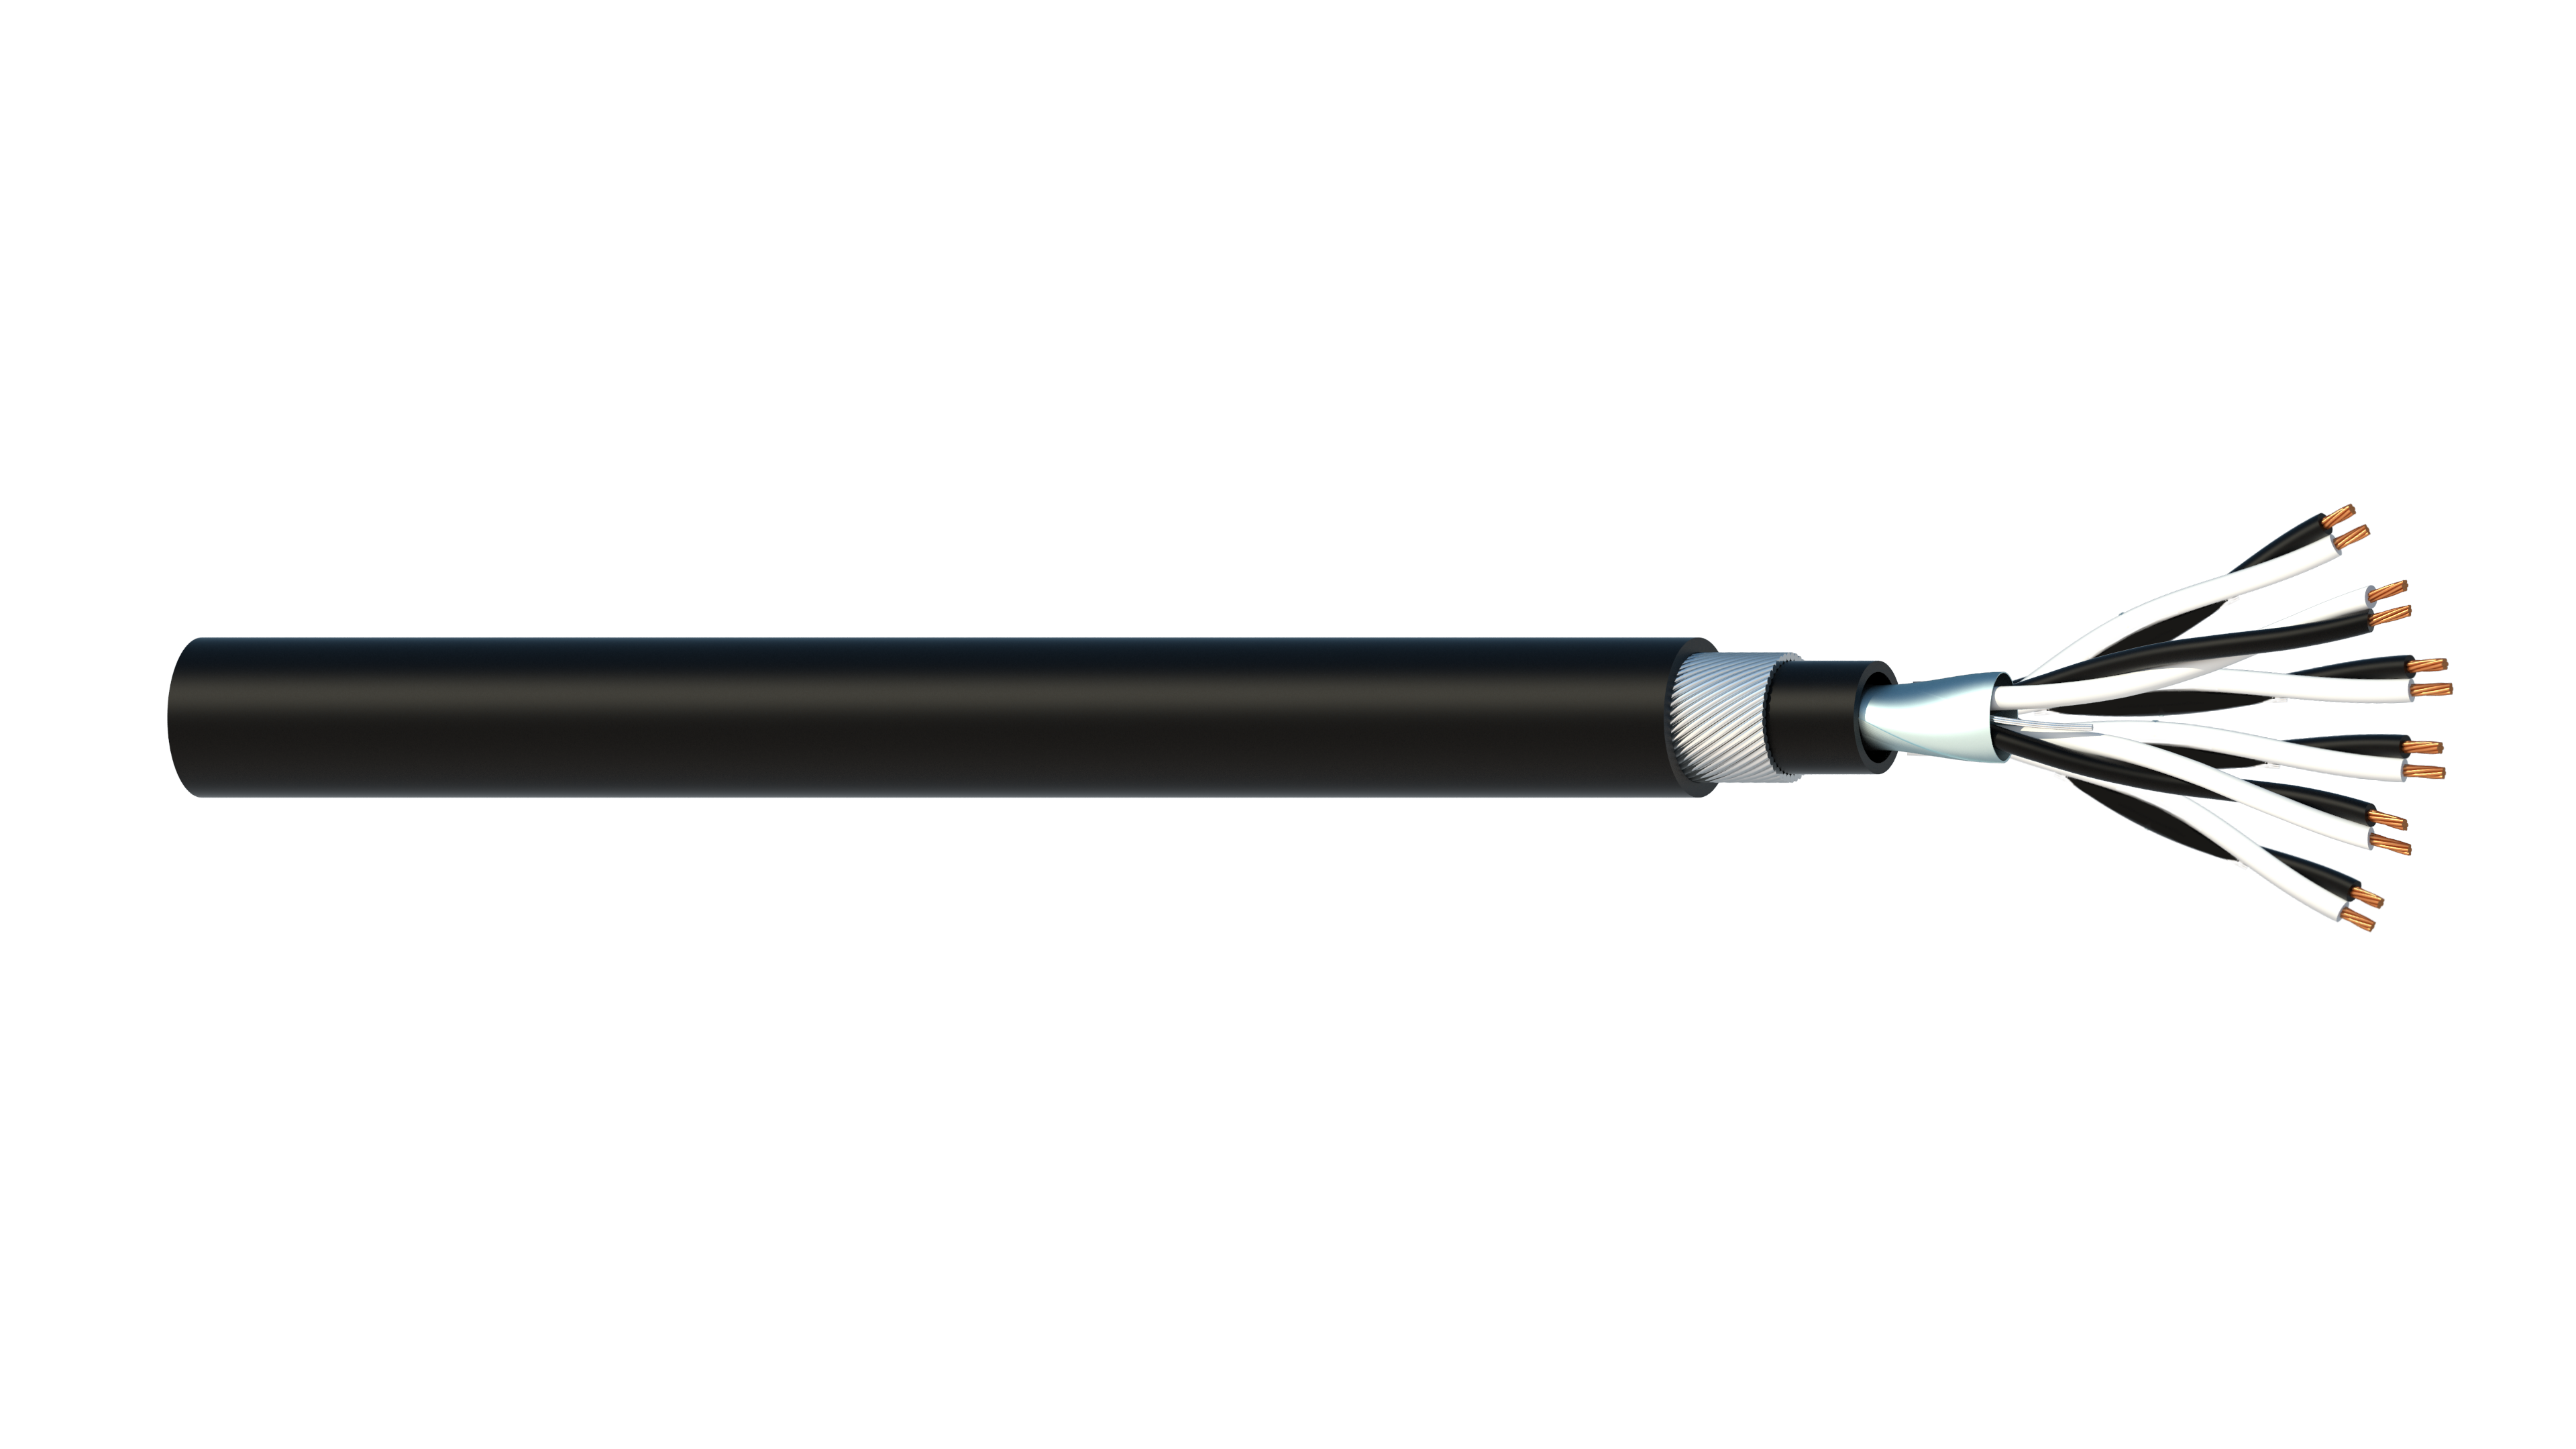 6 Pair 0.5mm2 Cu/PVC/OS/PVC/SWA/PVC Maser Instrumentation Cable - Black Sheath